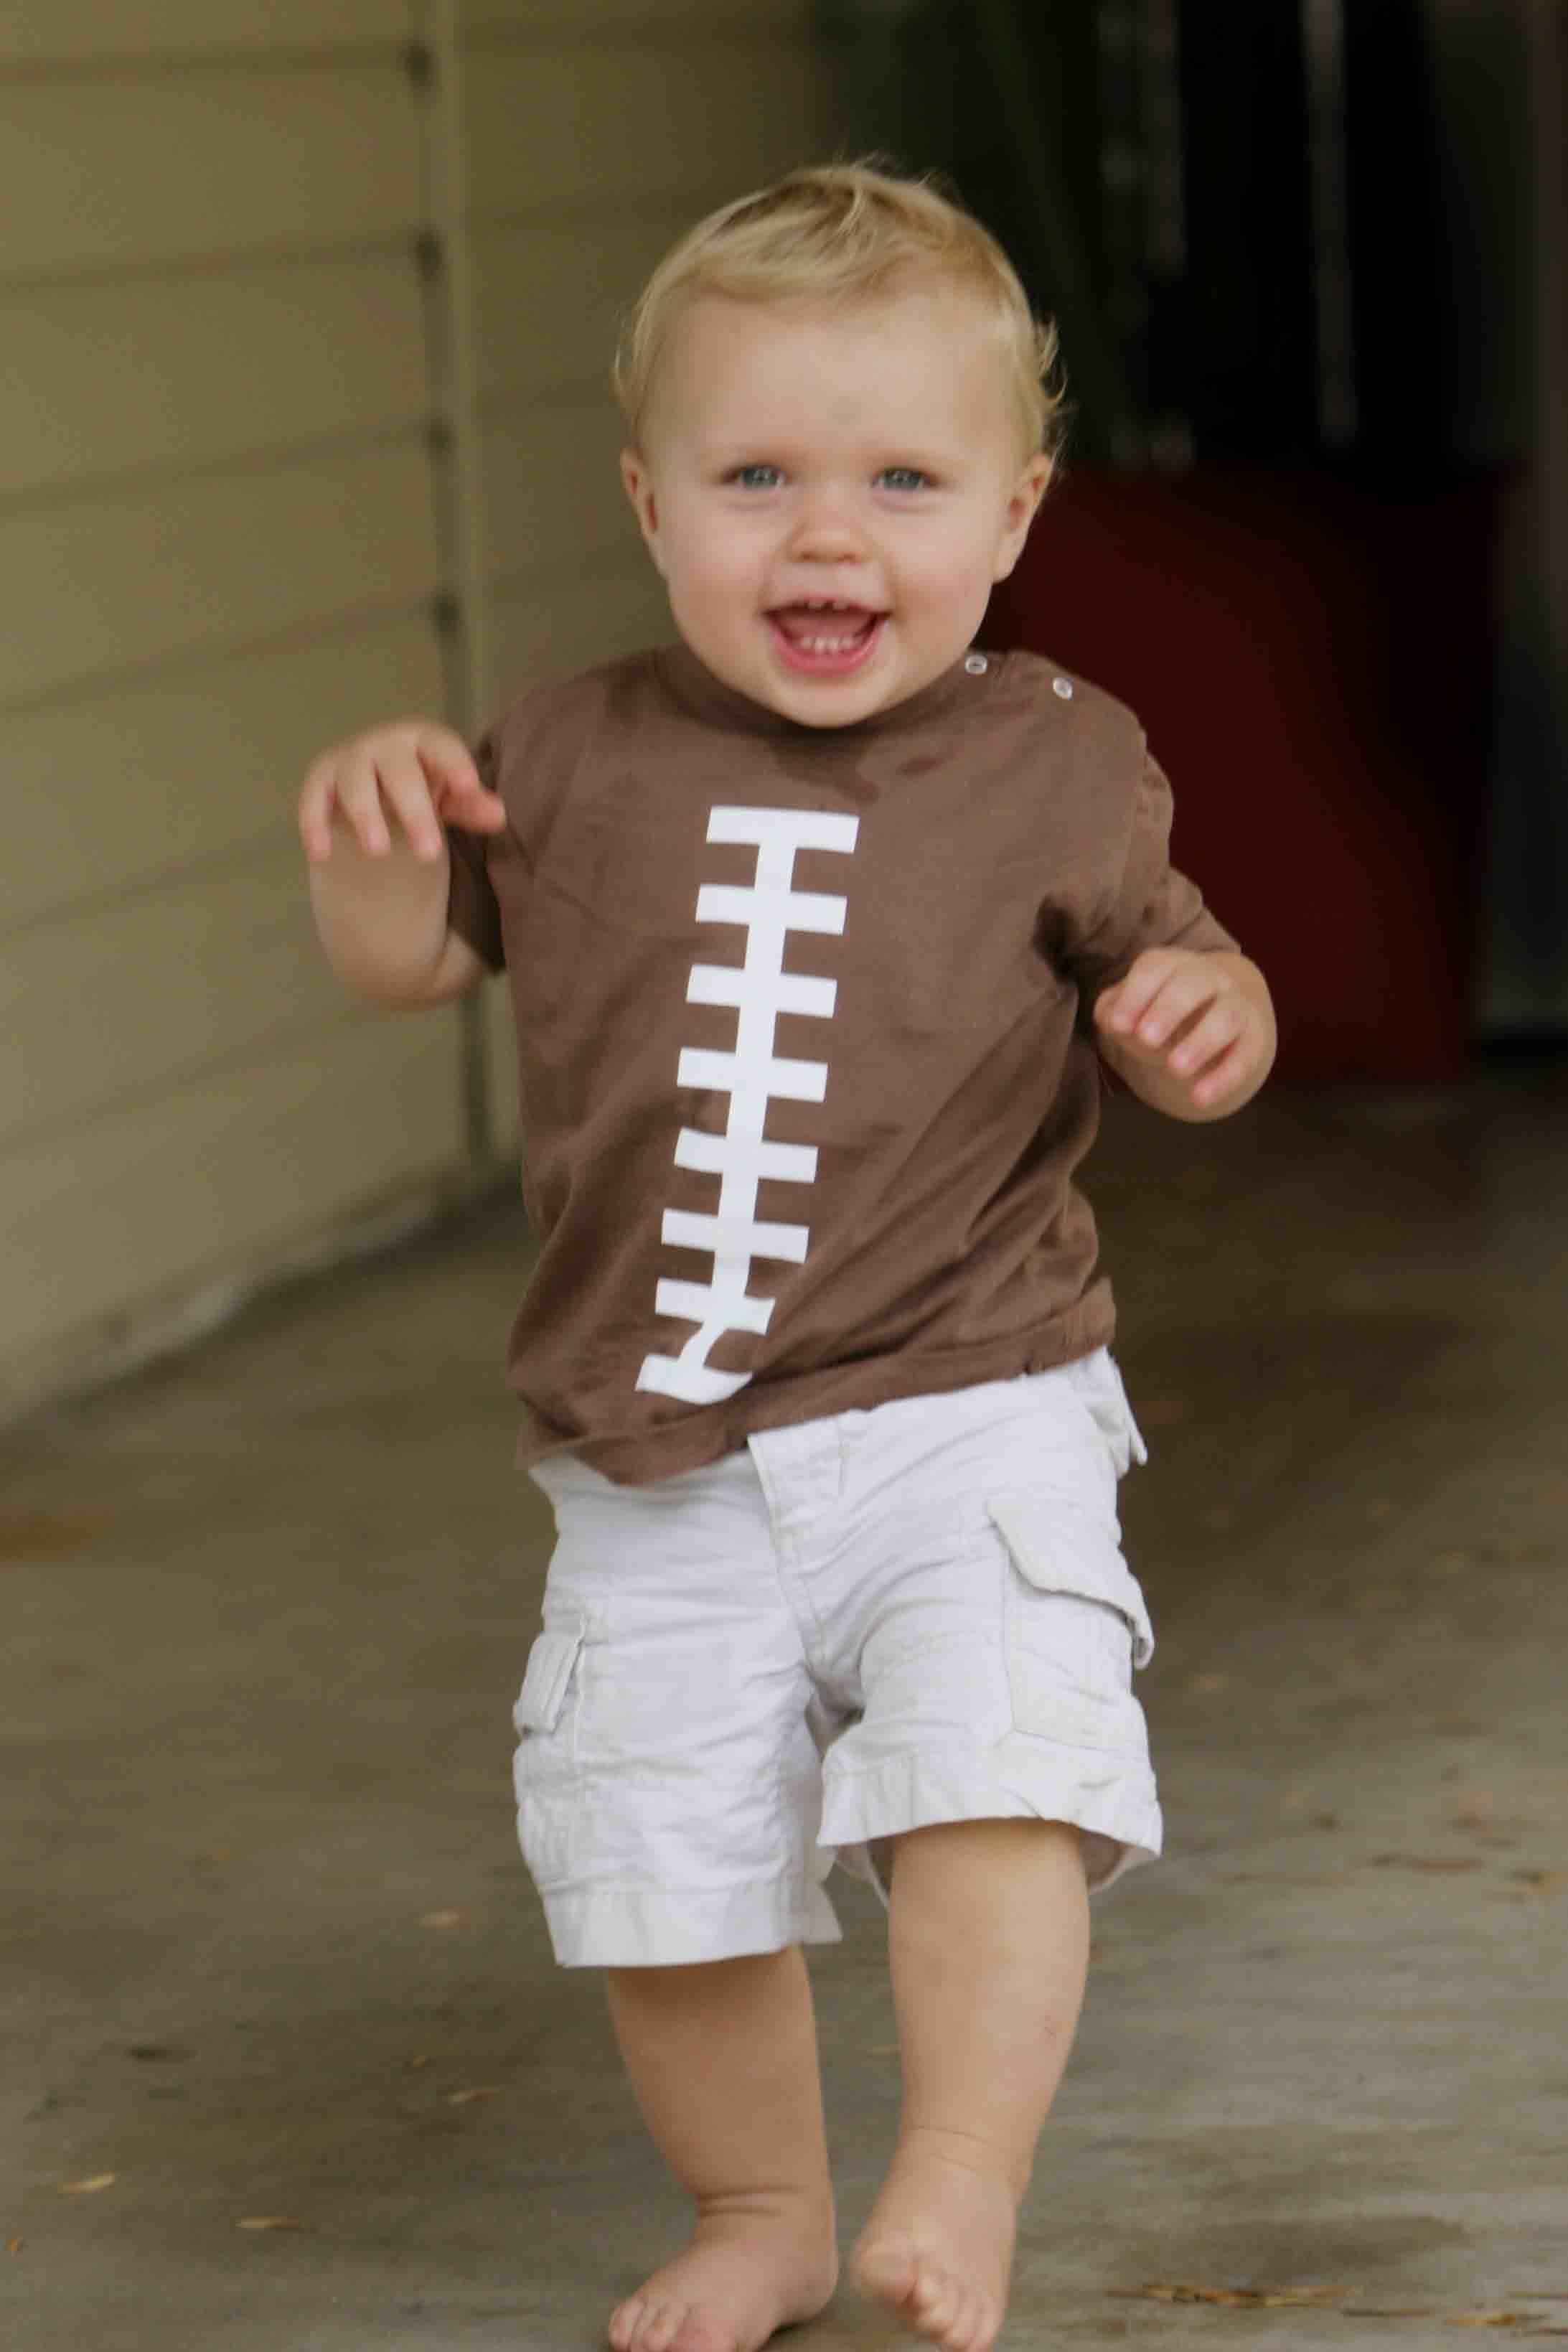 Clint heads for the endzone in his Football Bambino Ball Shirt - 30, 20, 10, Touchdown!